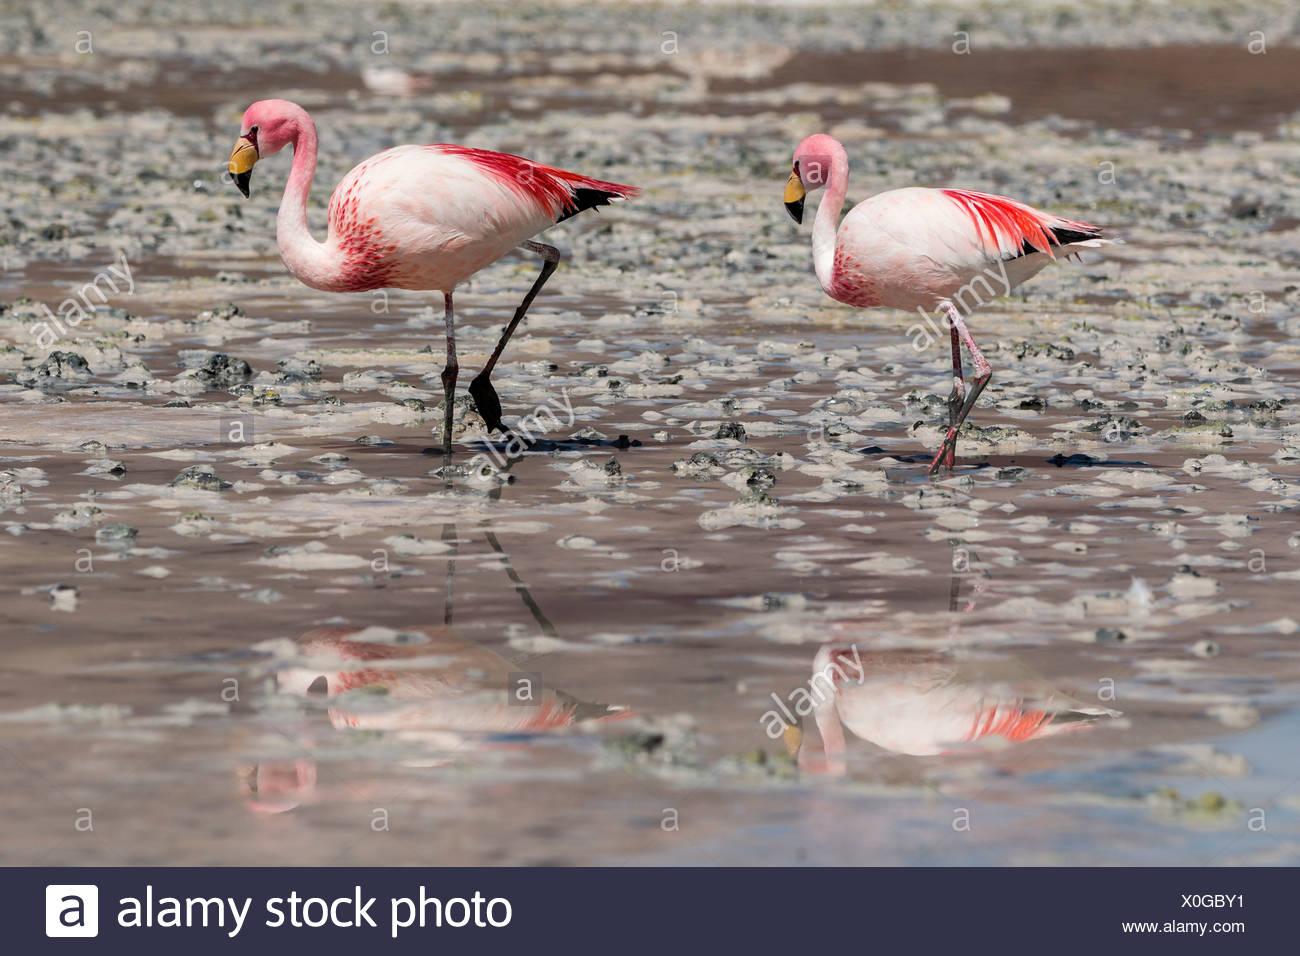 Andean flamingos (Phoenicoparrus andinus), Potosí Department, Bolivia - Stock Image